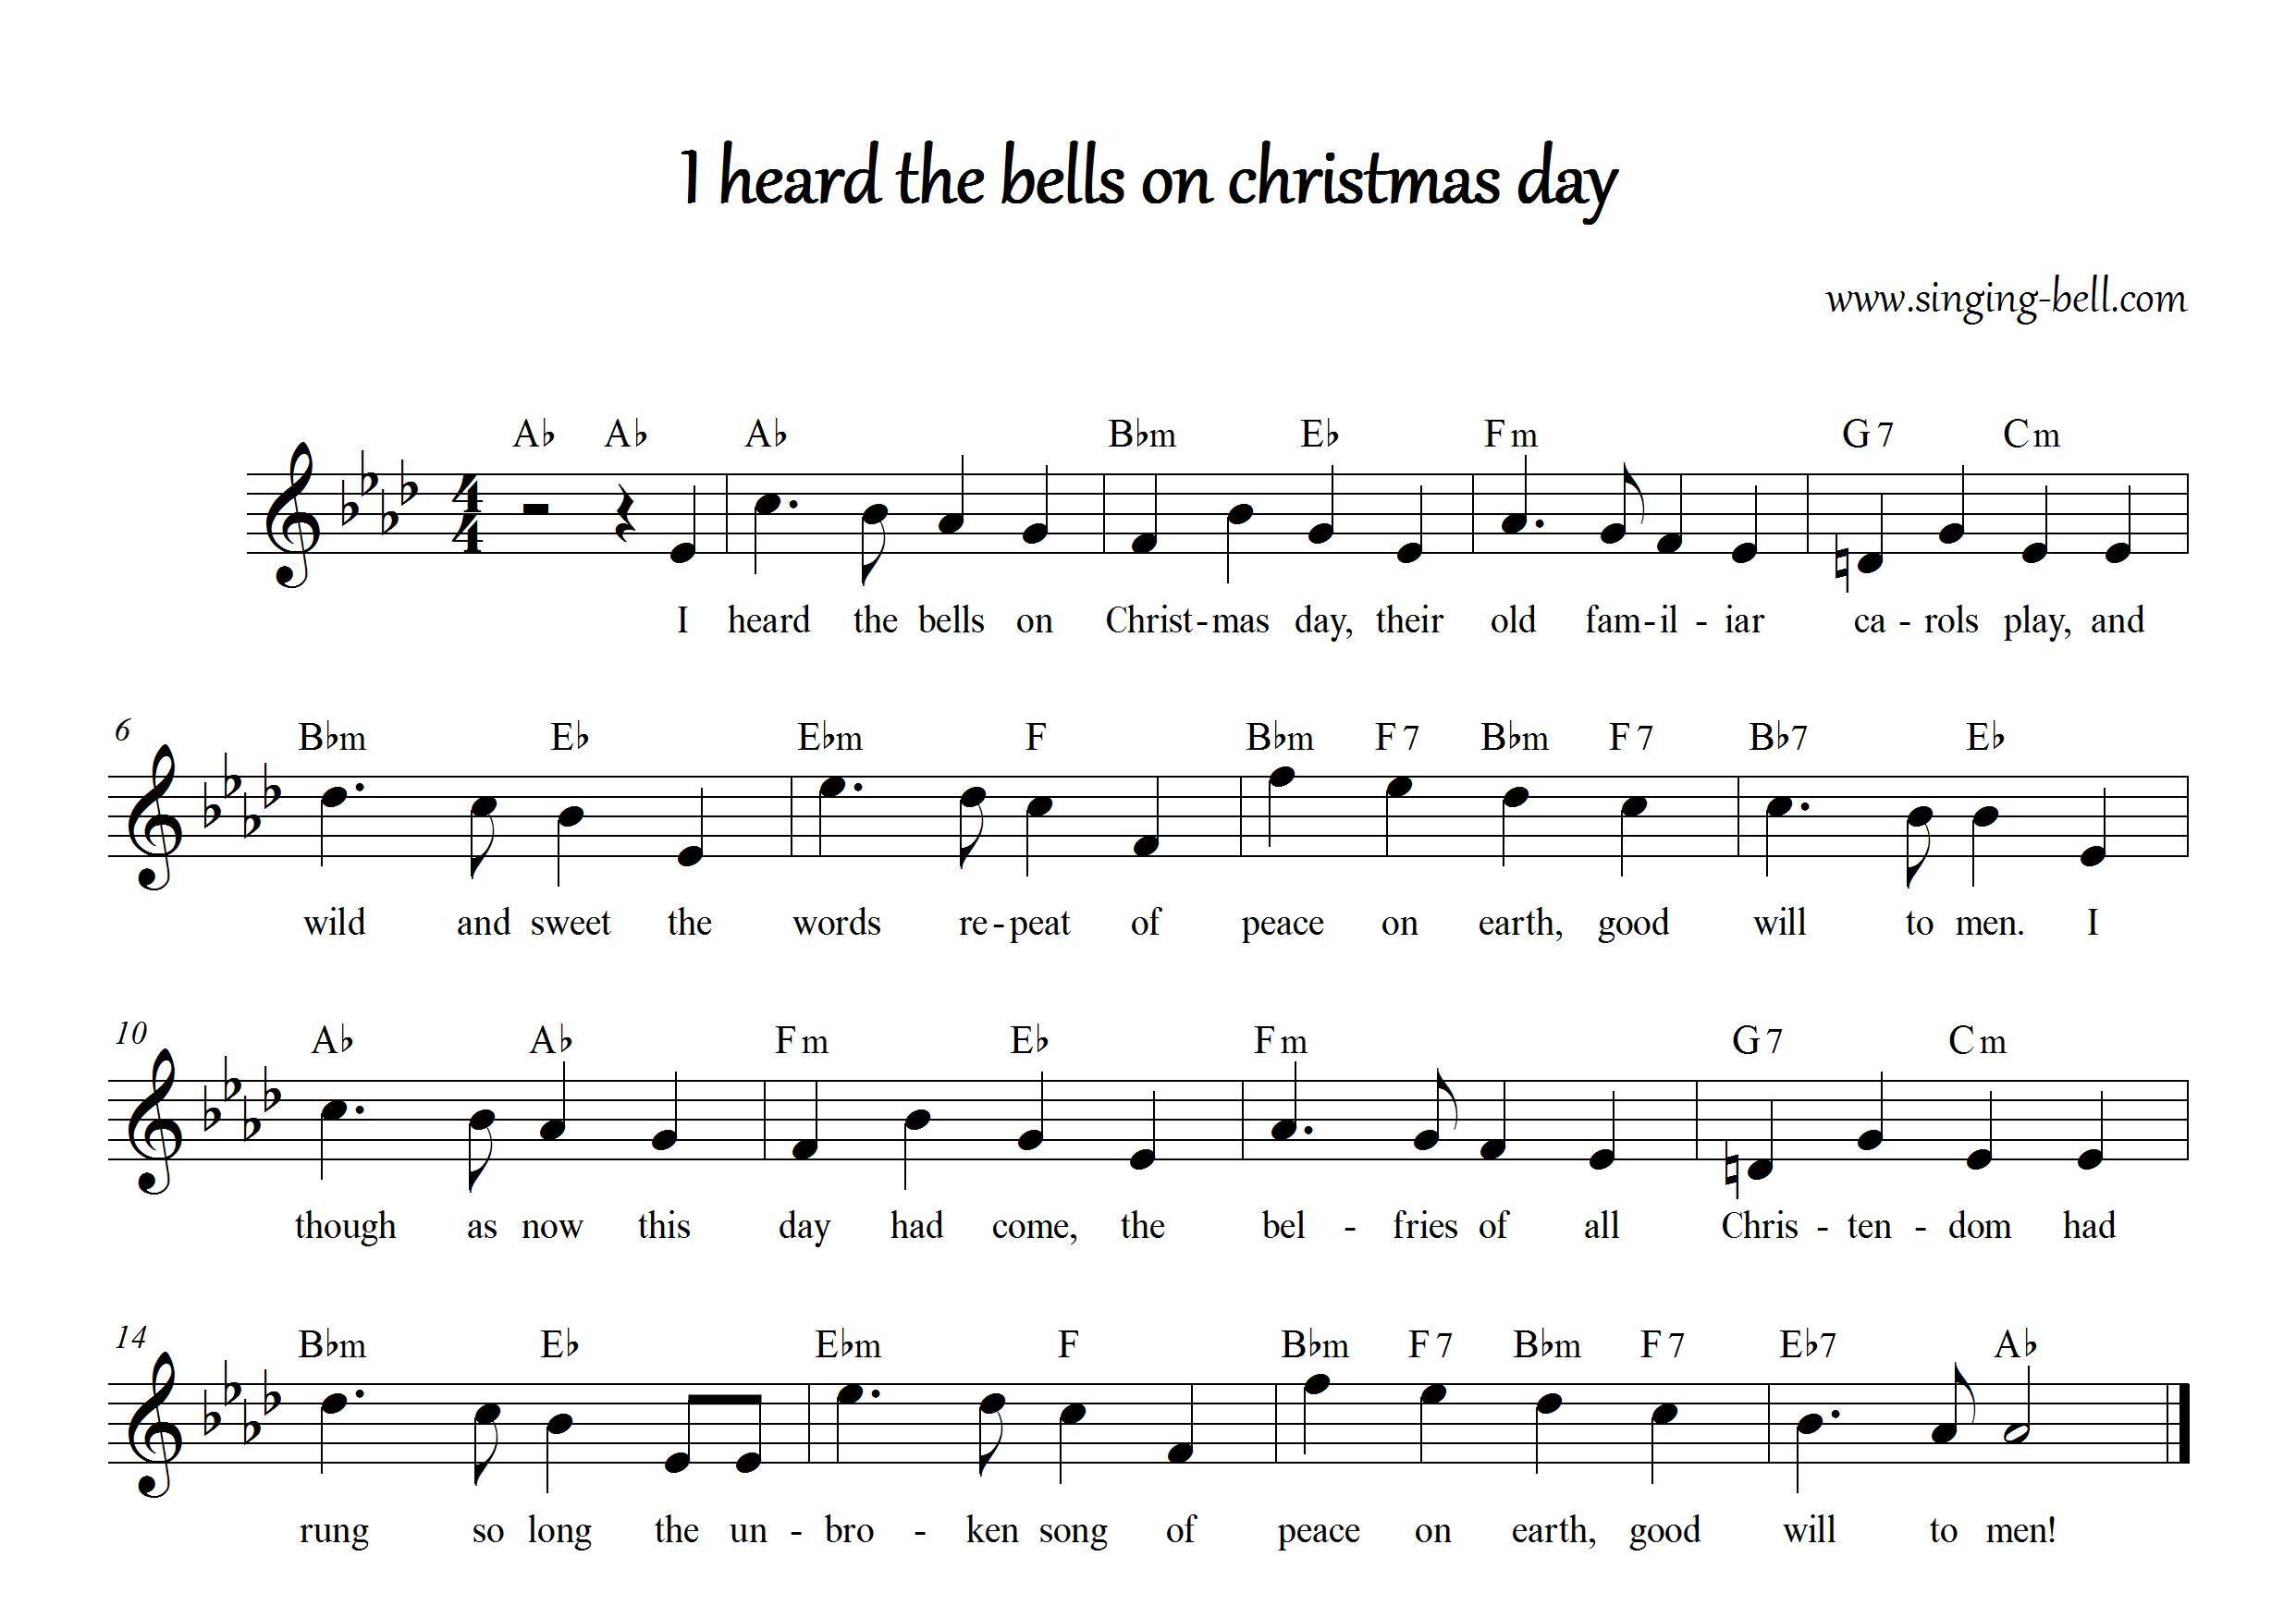 I Heard the Bells on Christmas Day Sheet music, Xmas